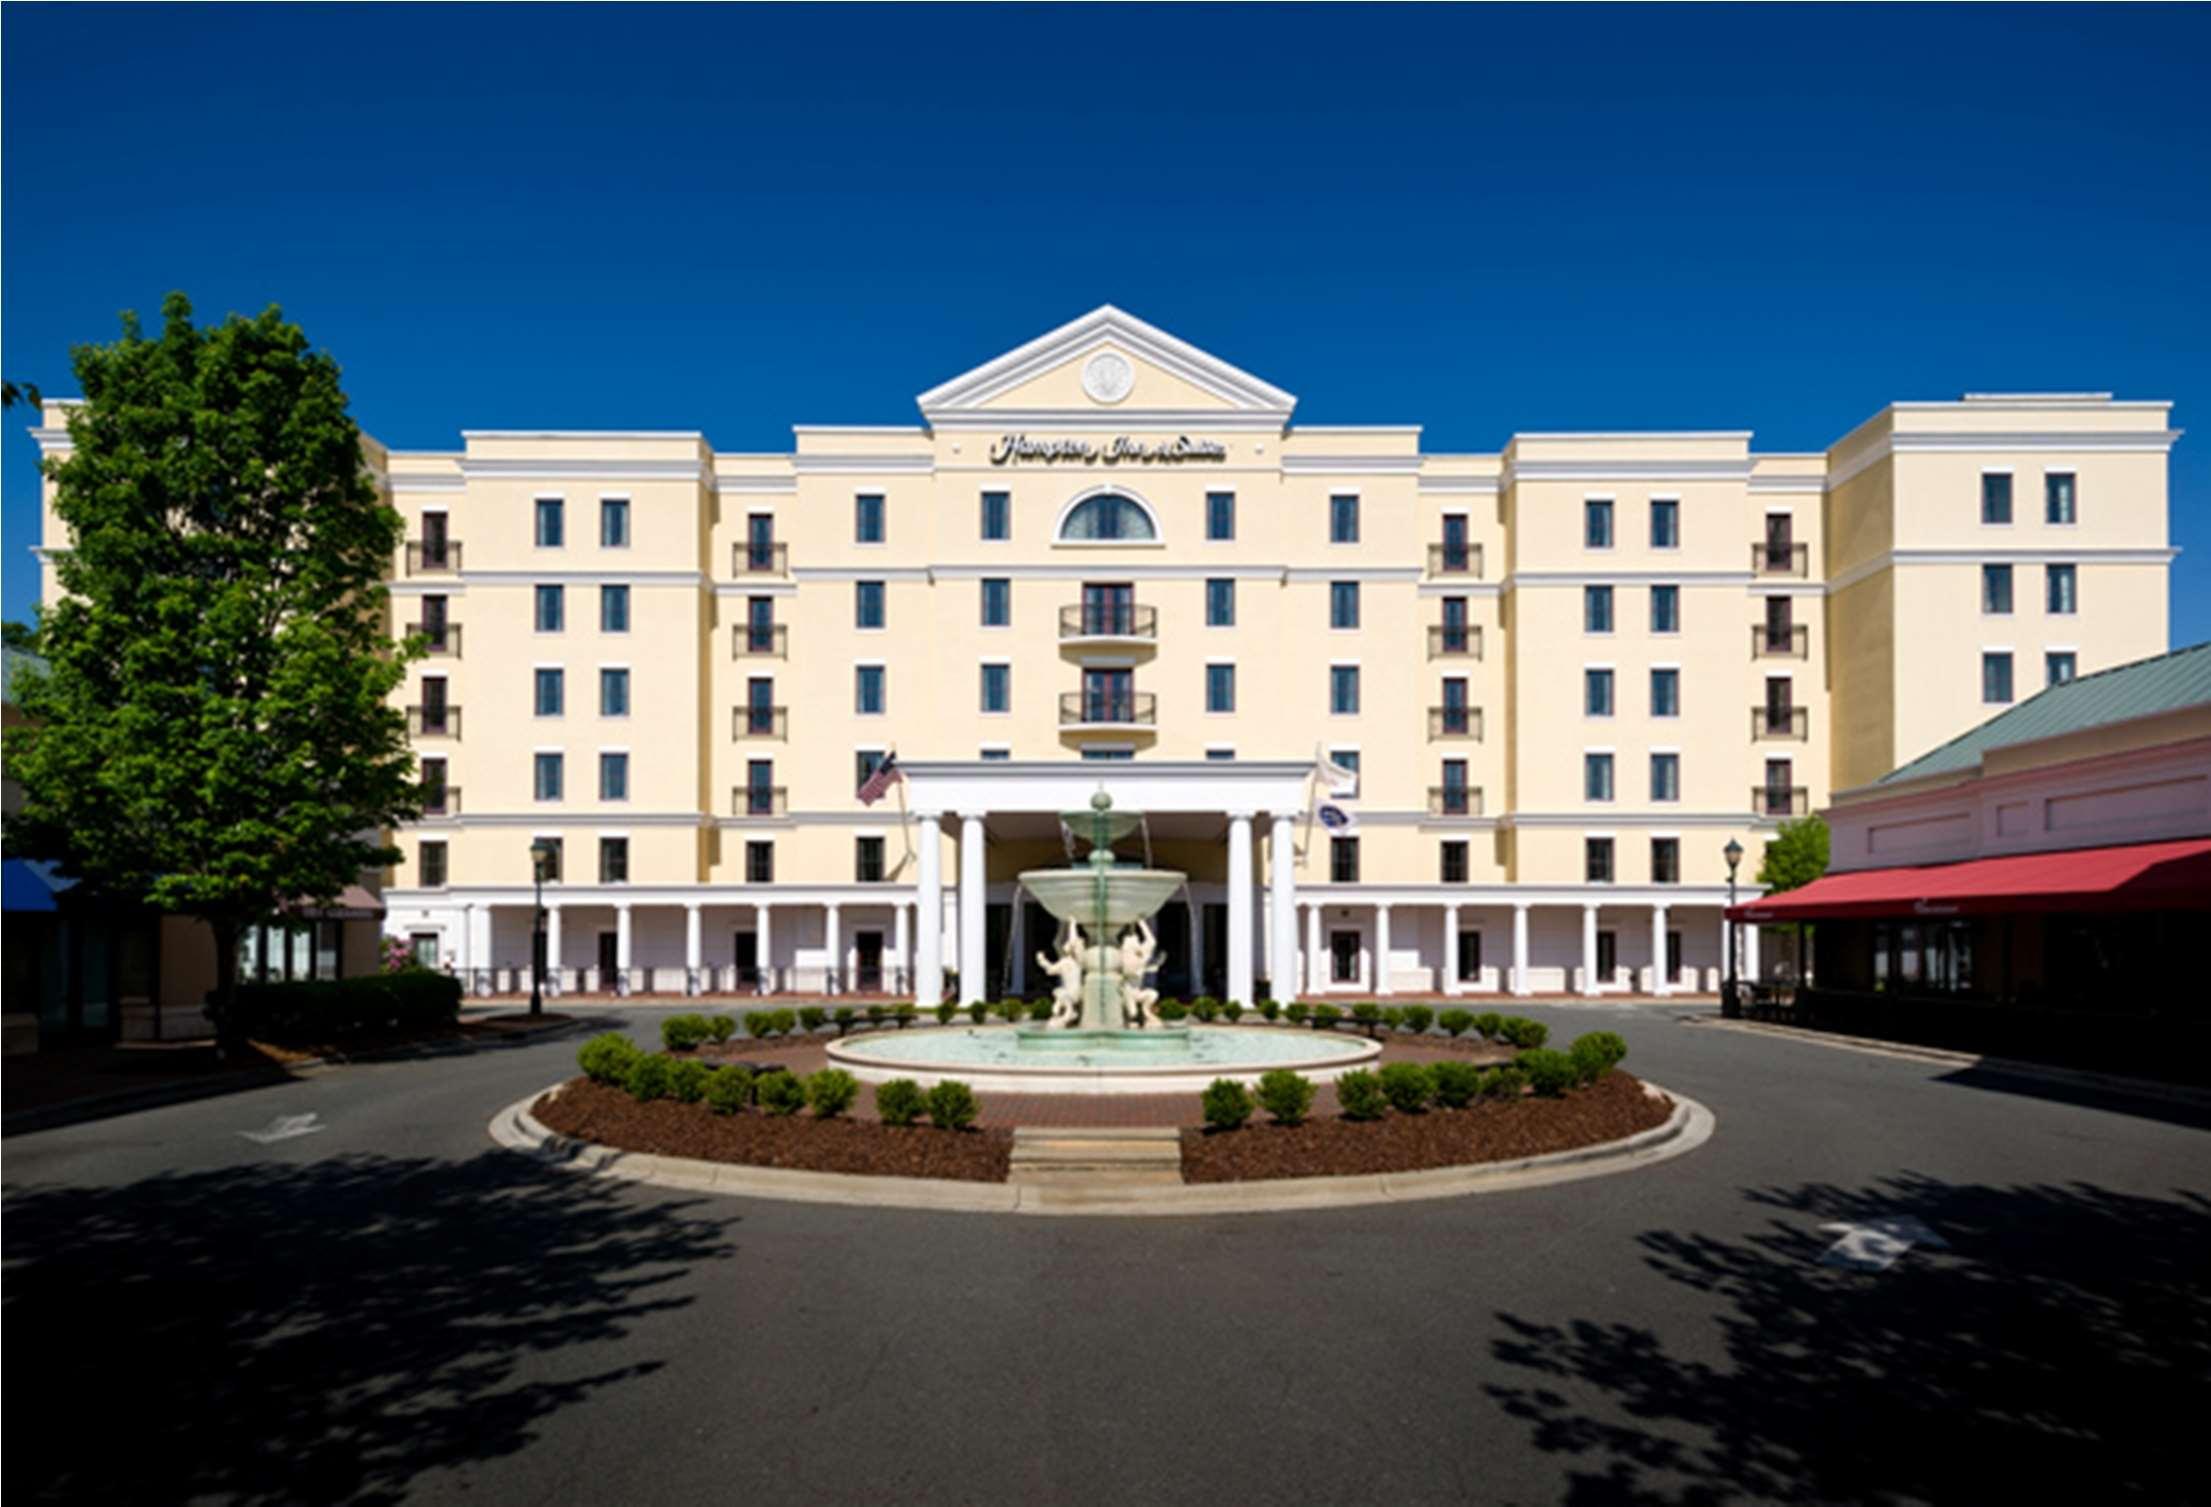 Hampton Inn & Suites Charlotte/South Park at Phillips Place image 1